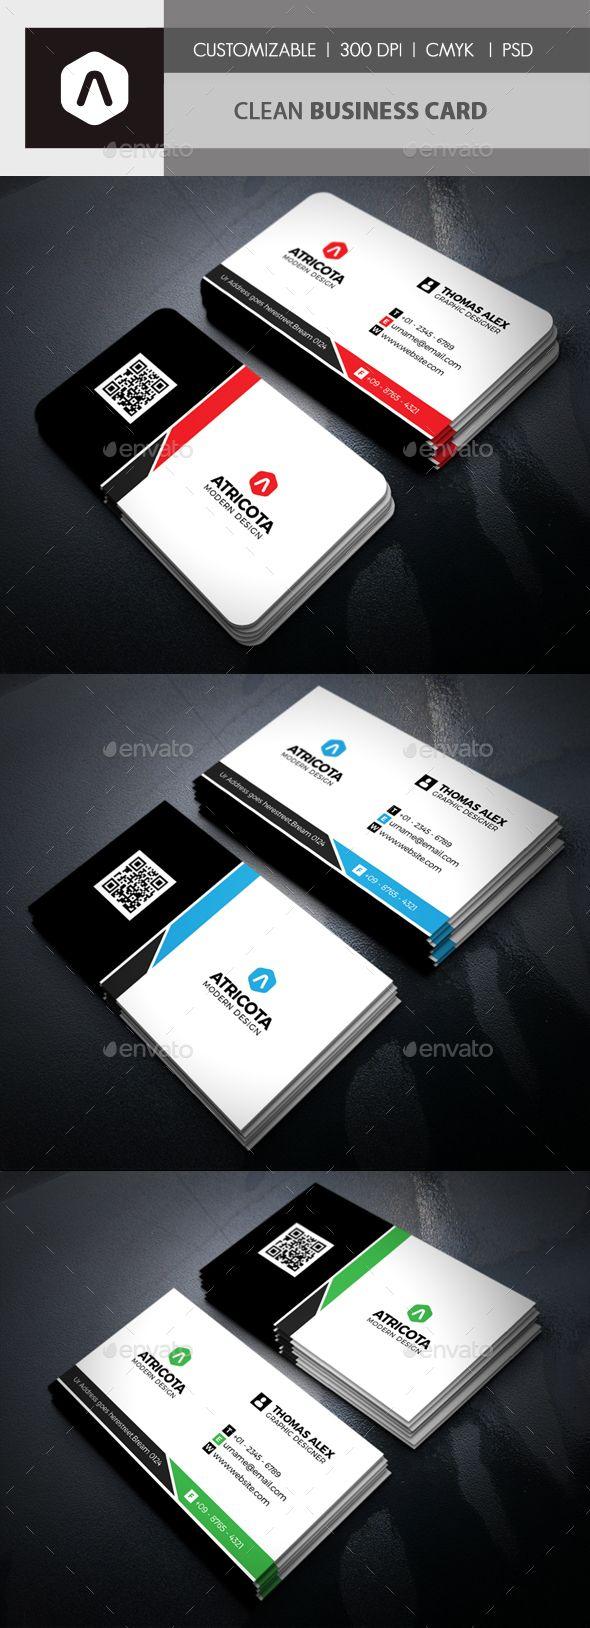 26 Modern Free Business Card Templates Psd Print Ready Design Business Card Design F Cool Business Cards Business Card Psd Free Business Card Templates